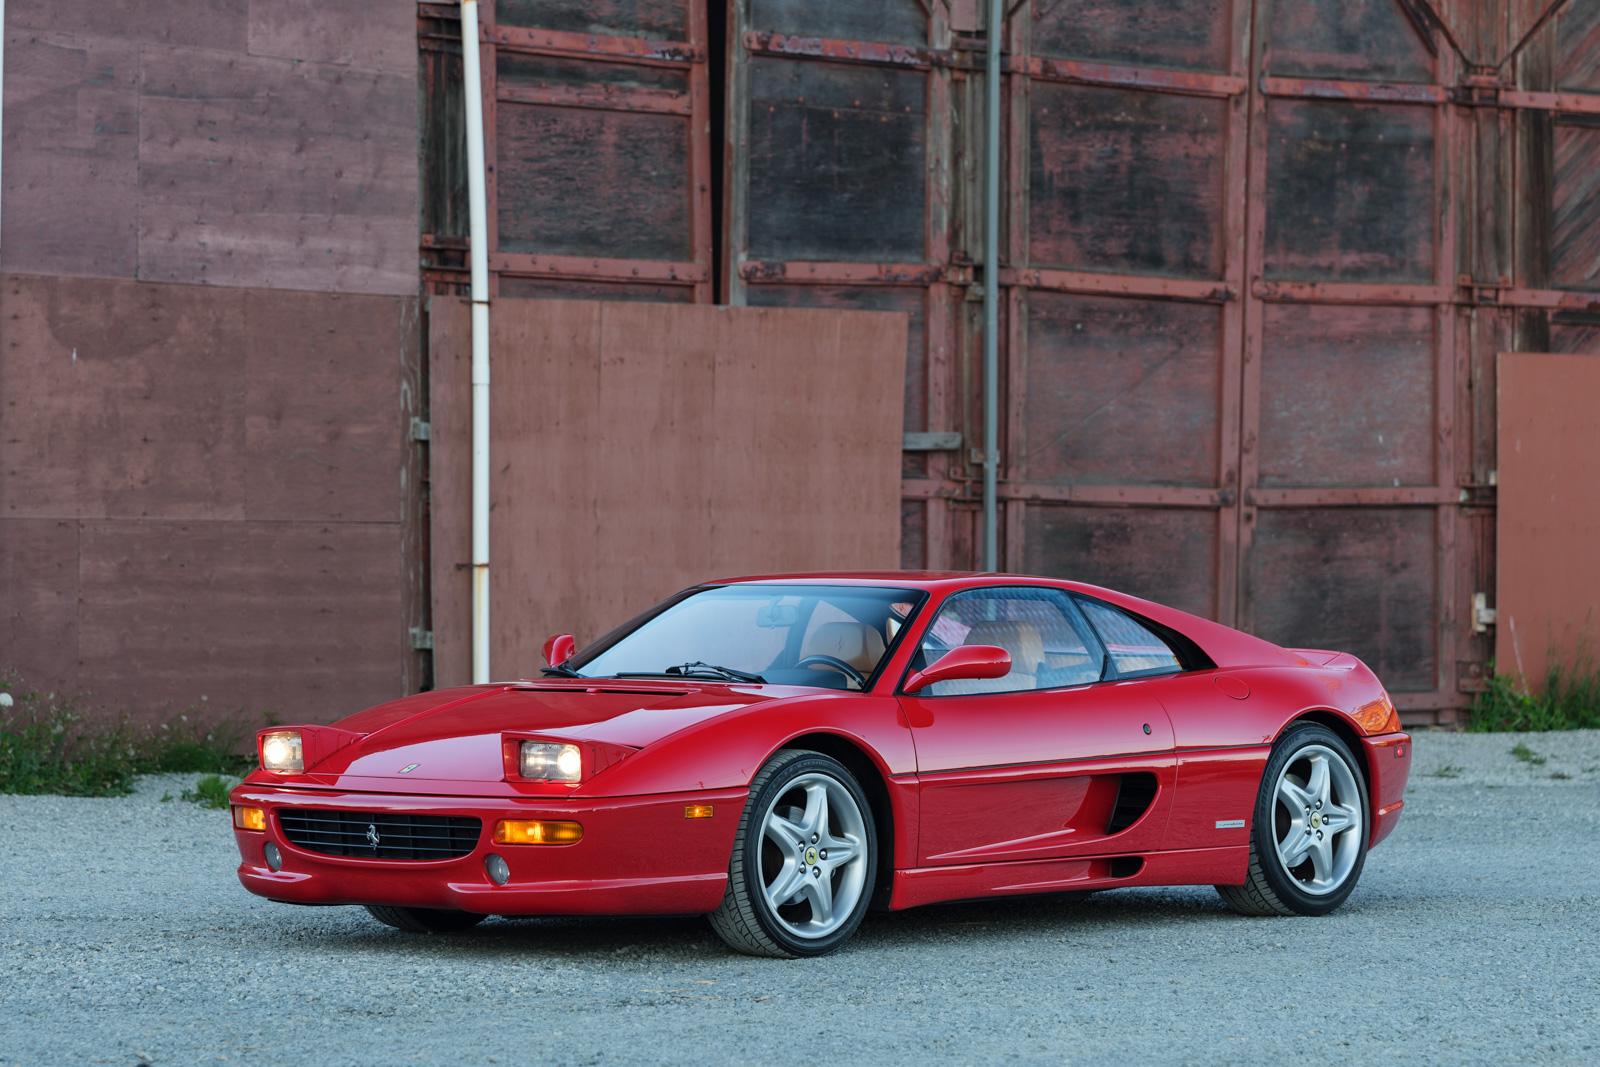 1994 Ferrari F355 Owner Manual 2019 Ebook Library